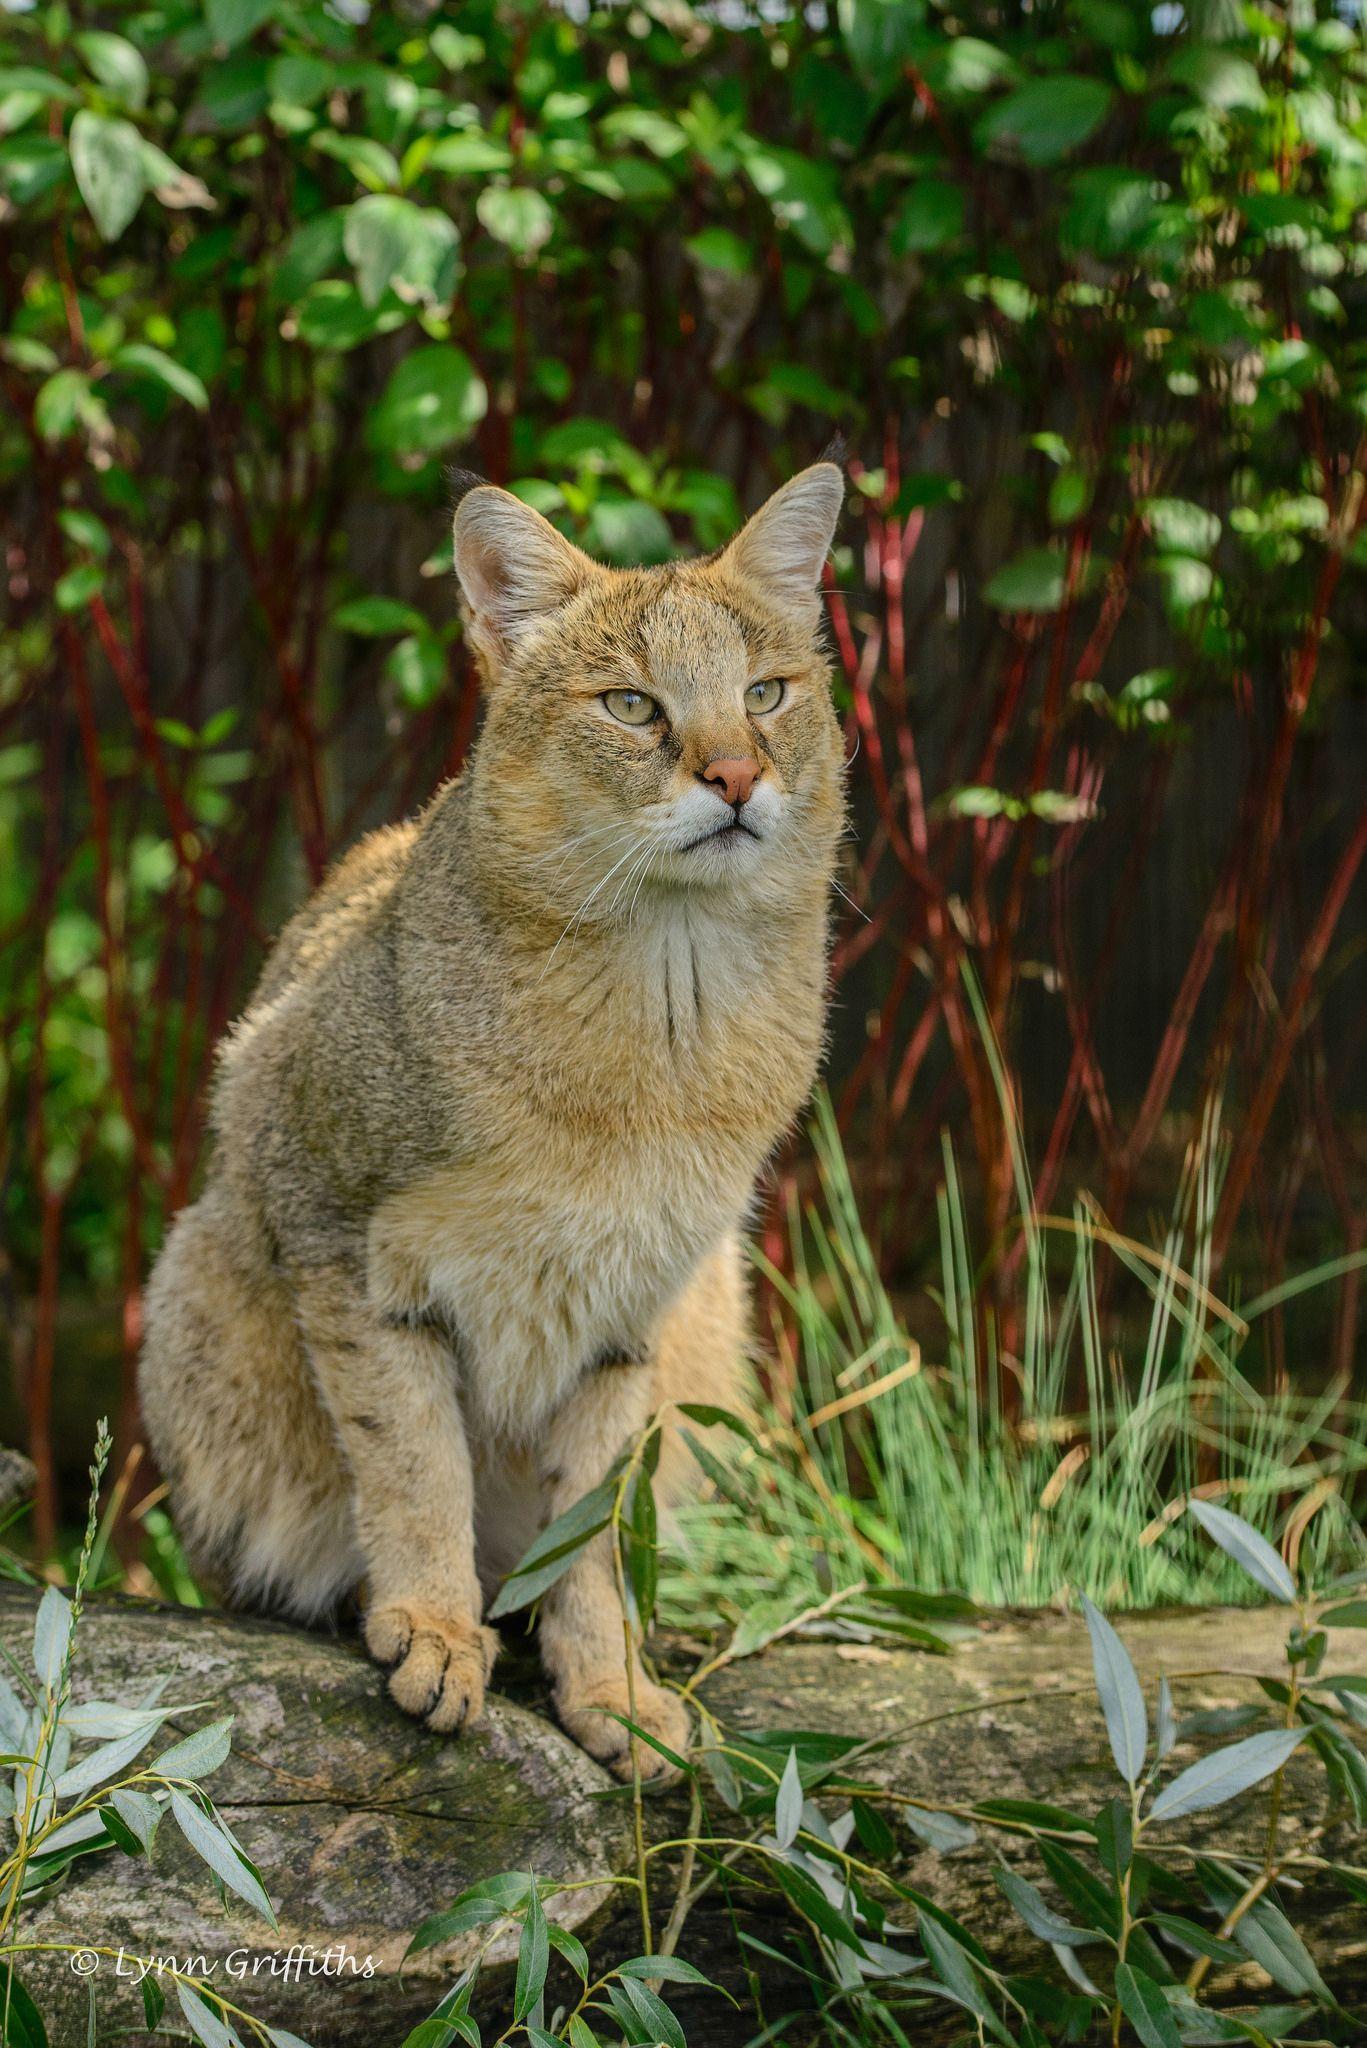 Jungle Cat (Felis Chaus) D61_5145.jpg Wild cat species